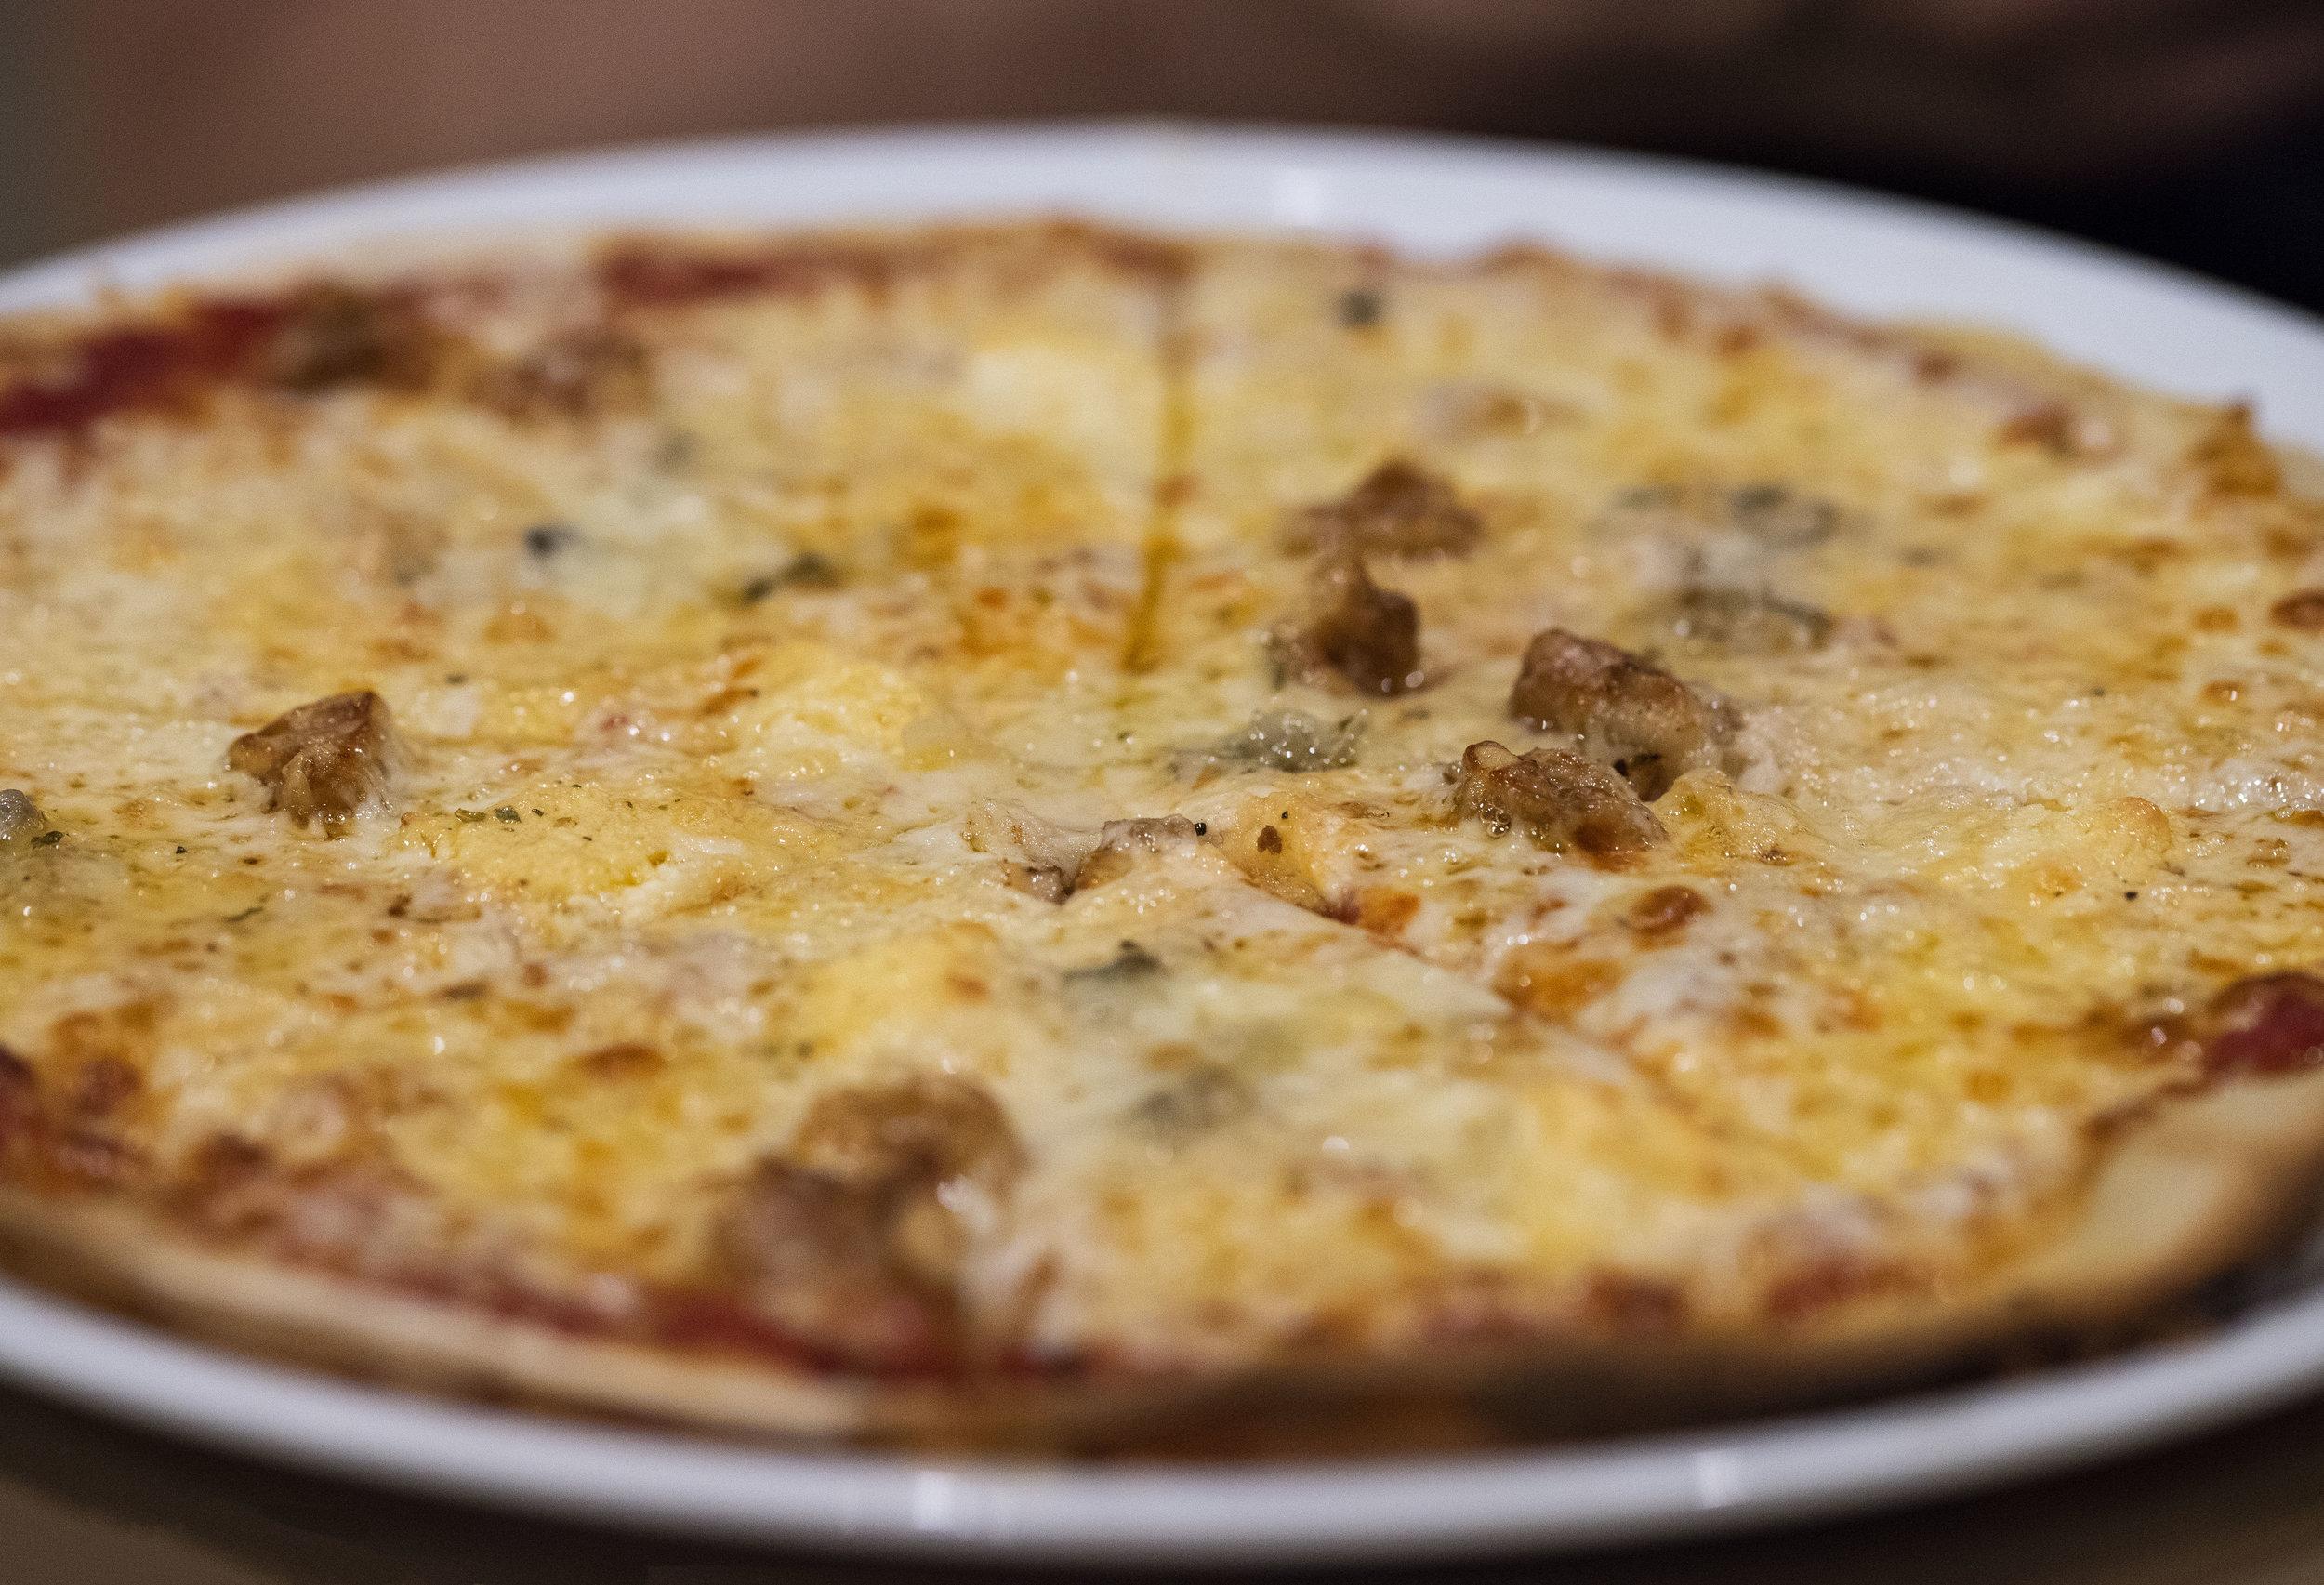 Gluten free pizza at Messie, Barcelona